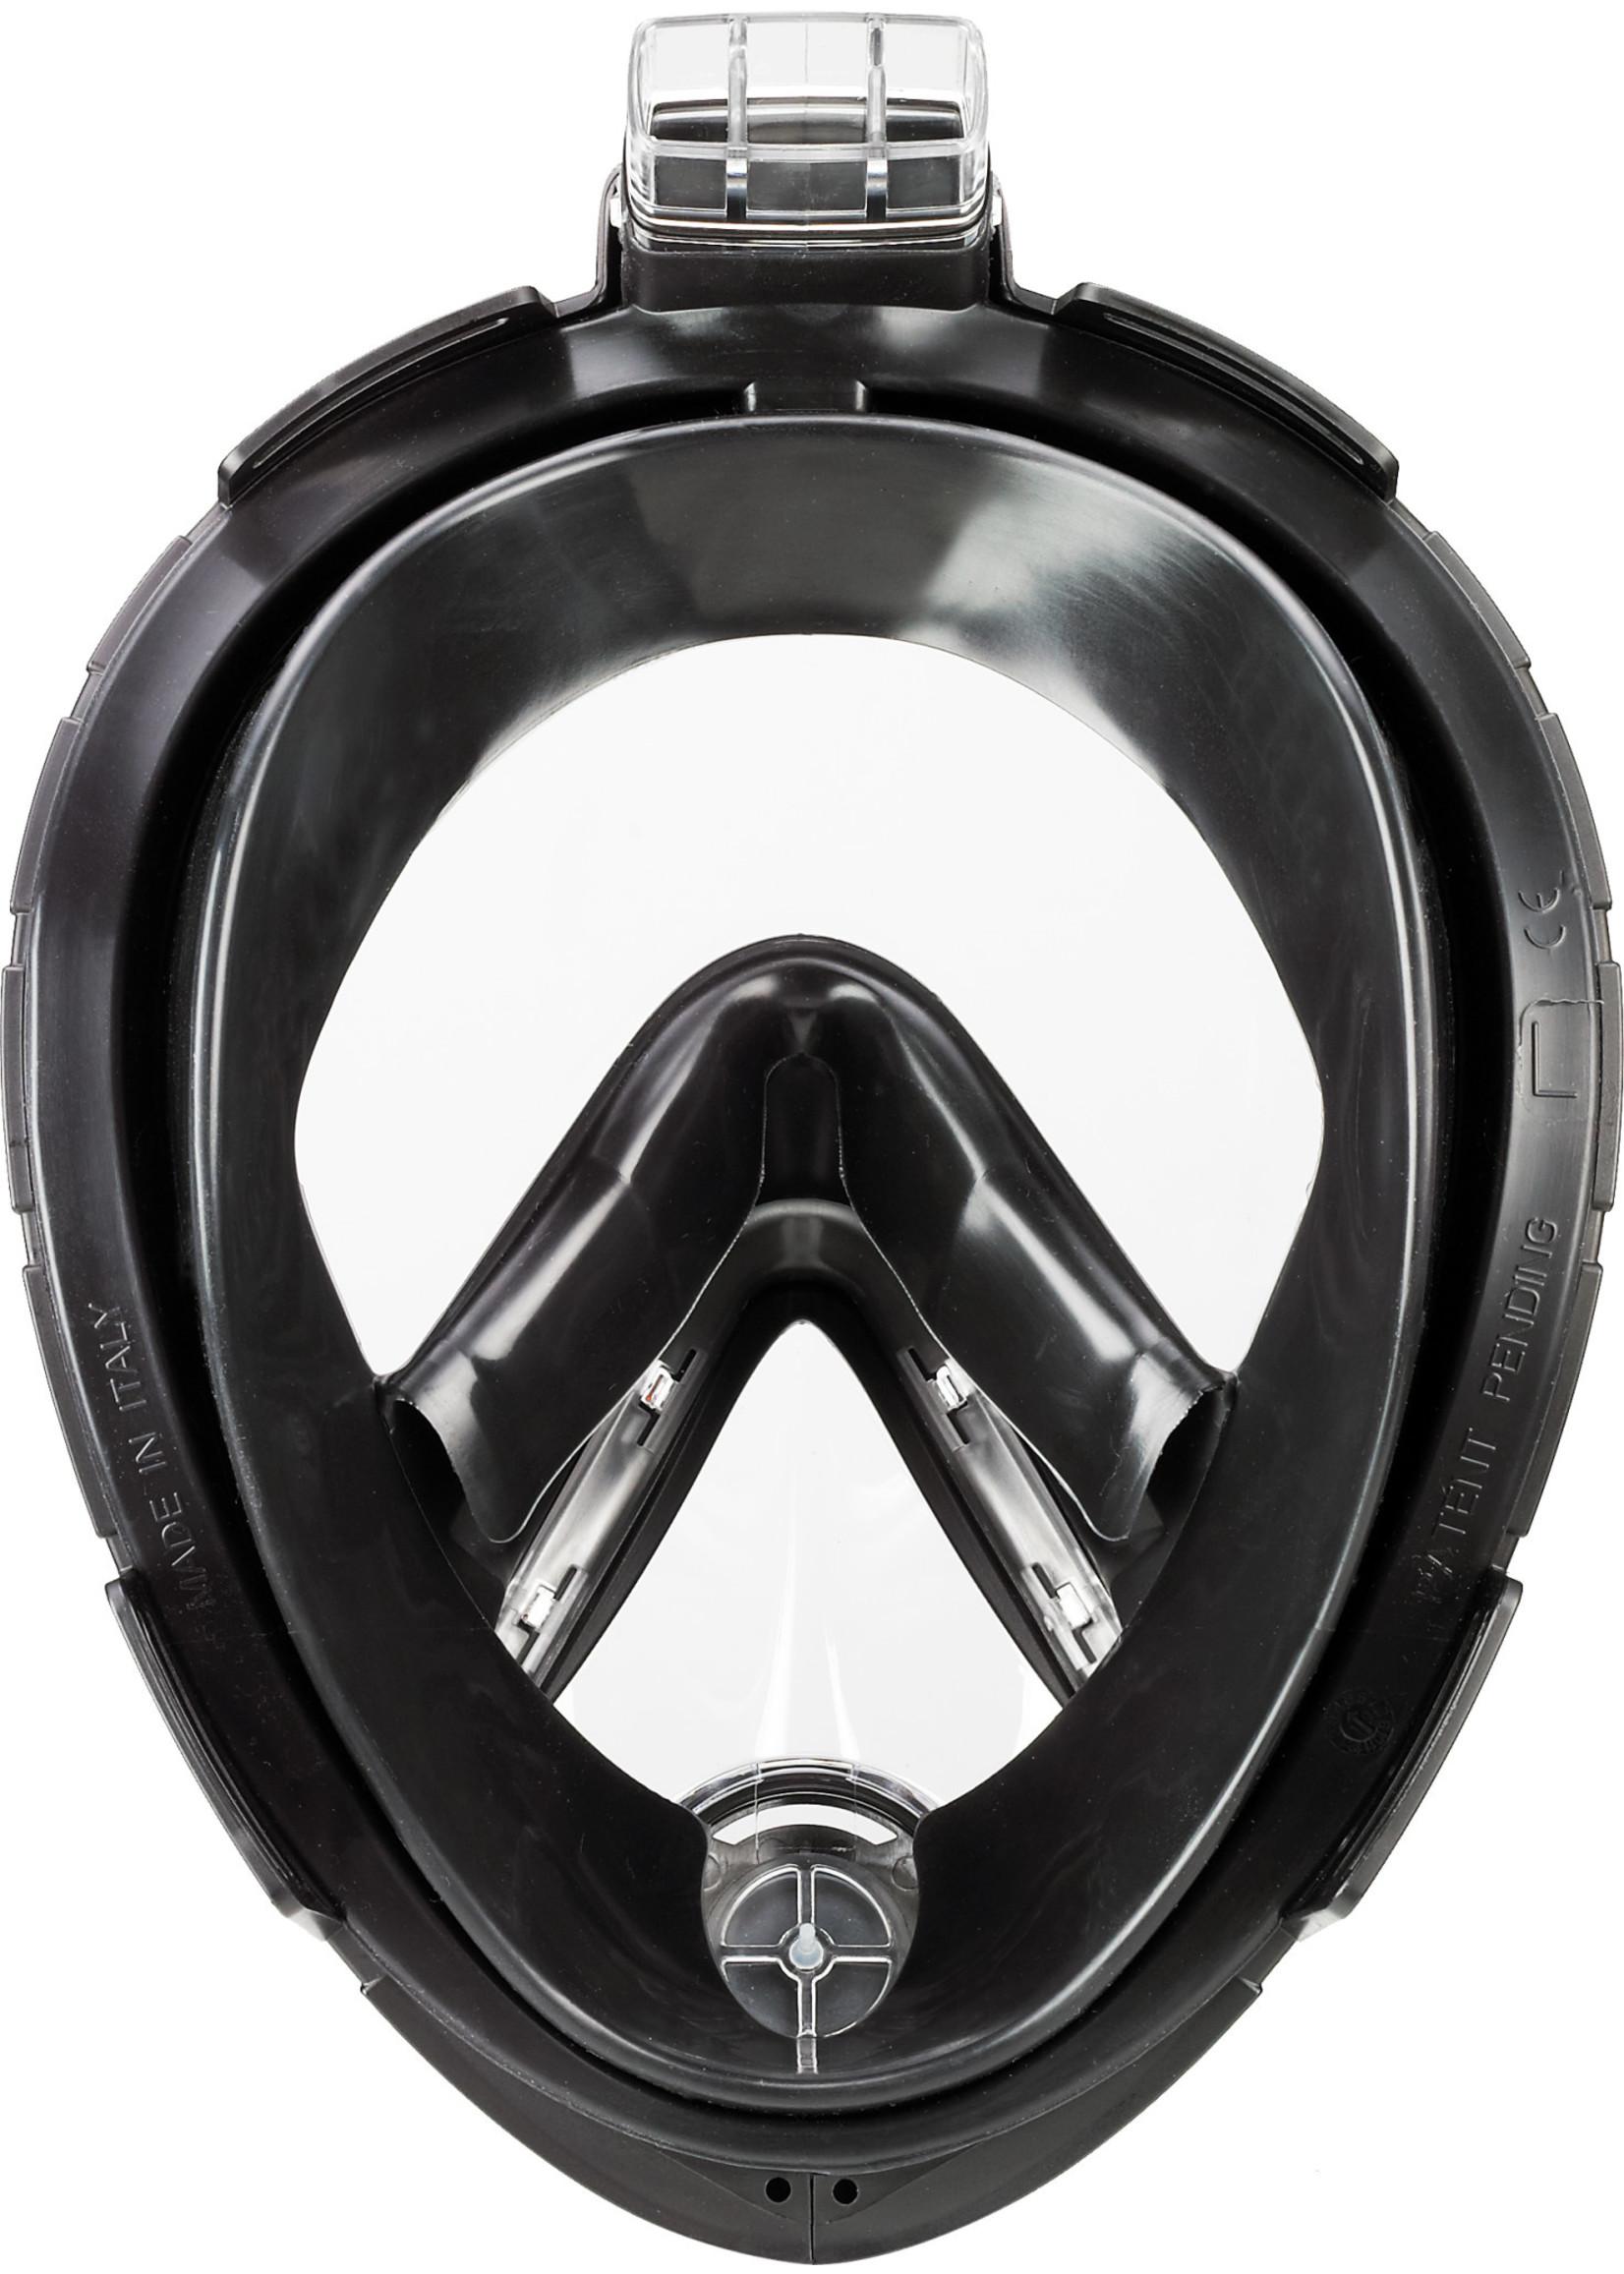 TUSA TUSA Full-Face Snorkeling Mask - Black